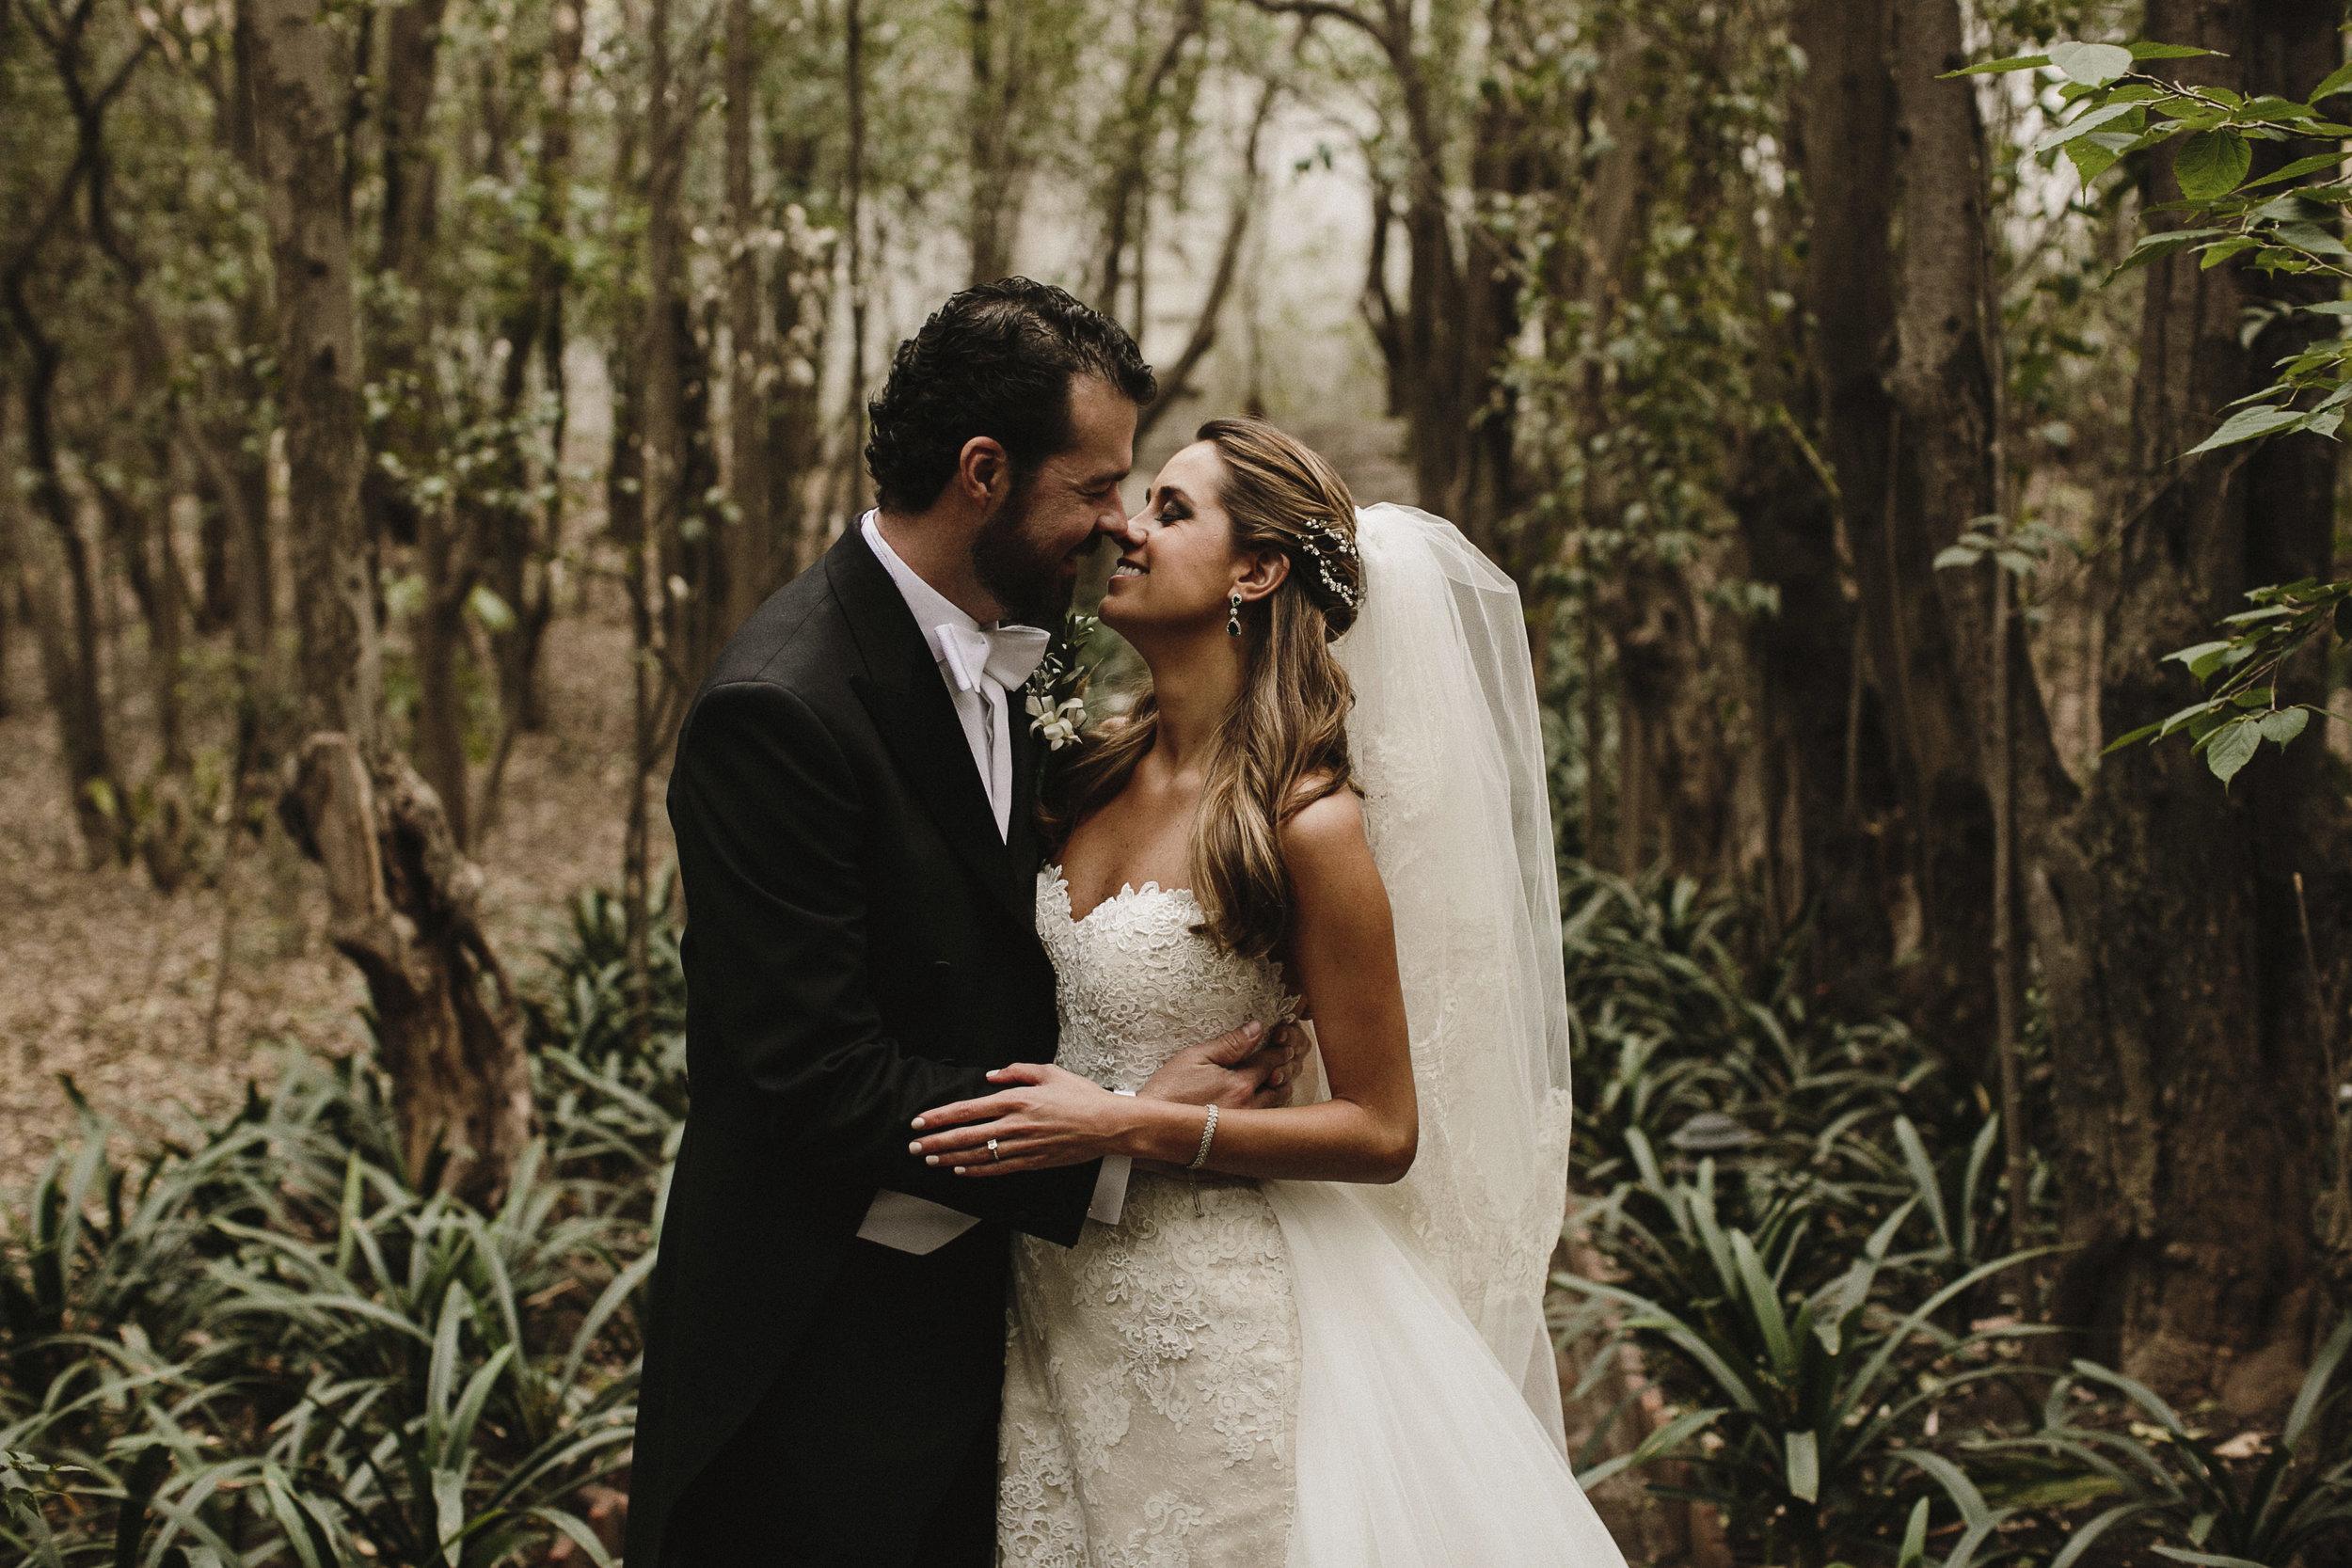 alfonso_flores_destination_wedding_photogrpahy_paola_alonso-233.JPG